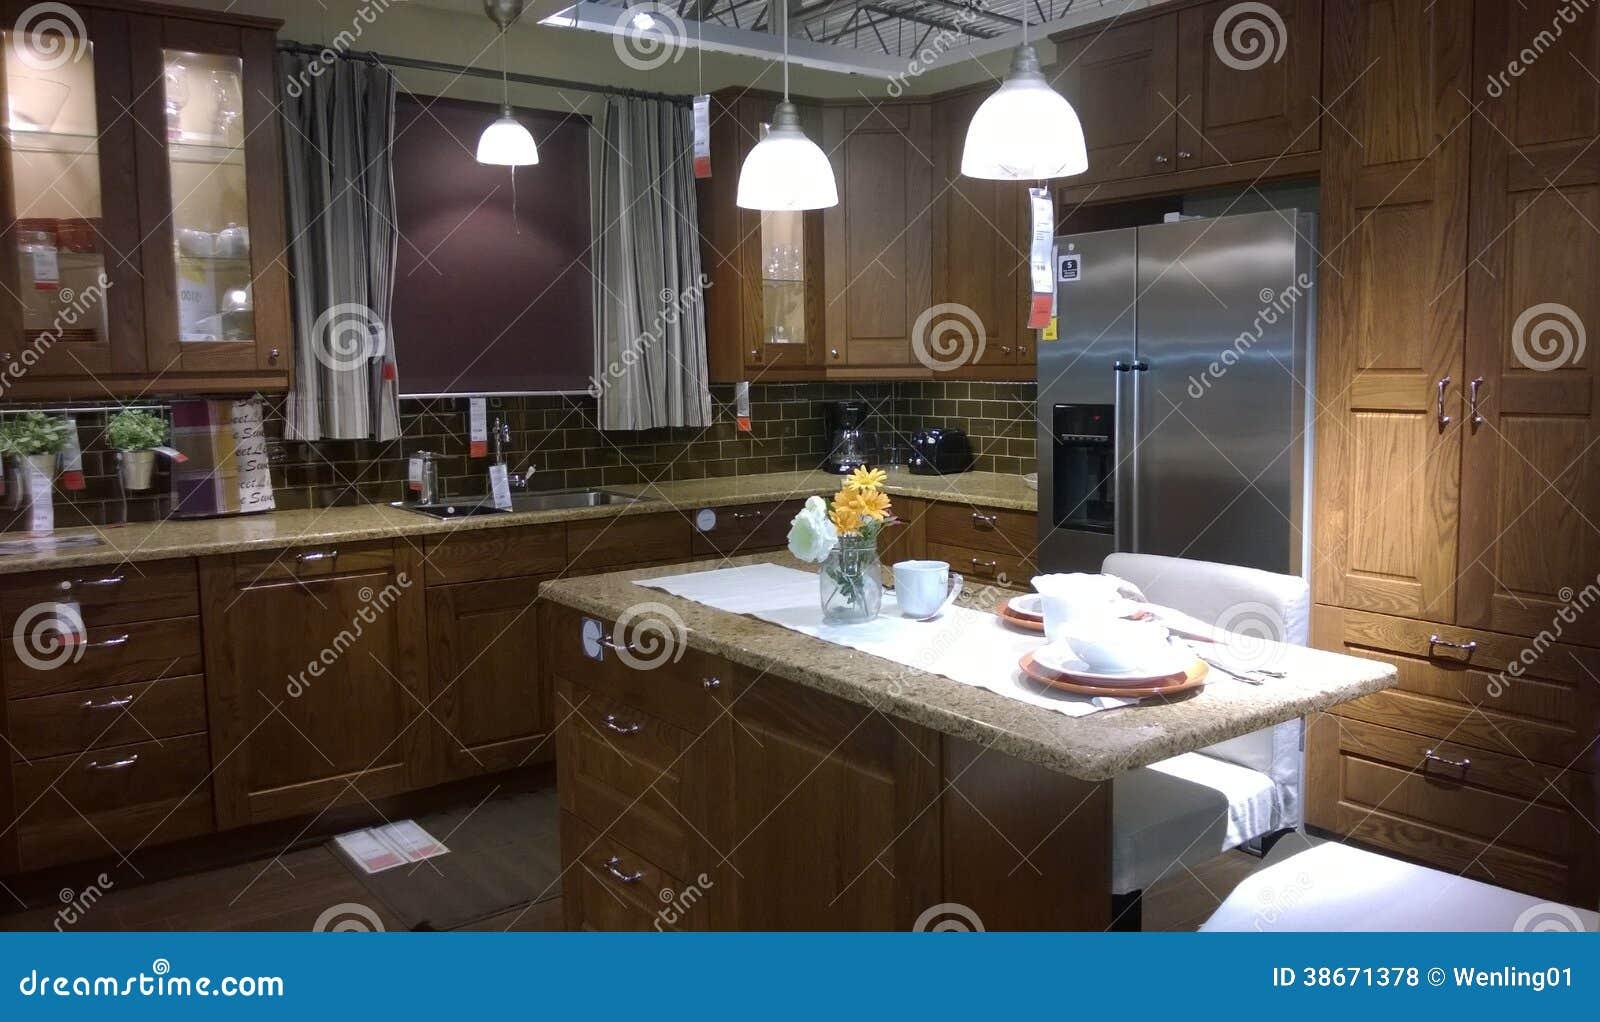 Kitchen Design Editorial Stock Photo Image 38671378